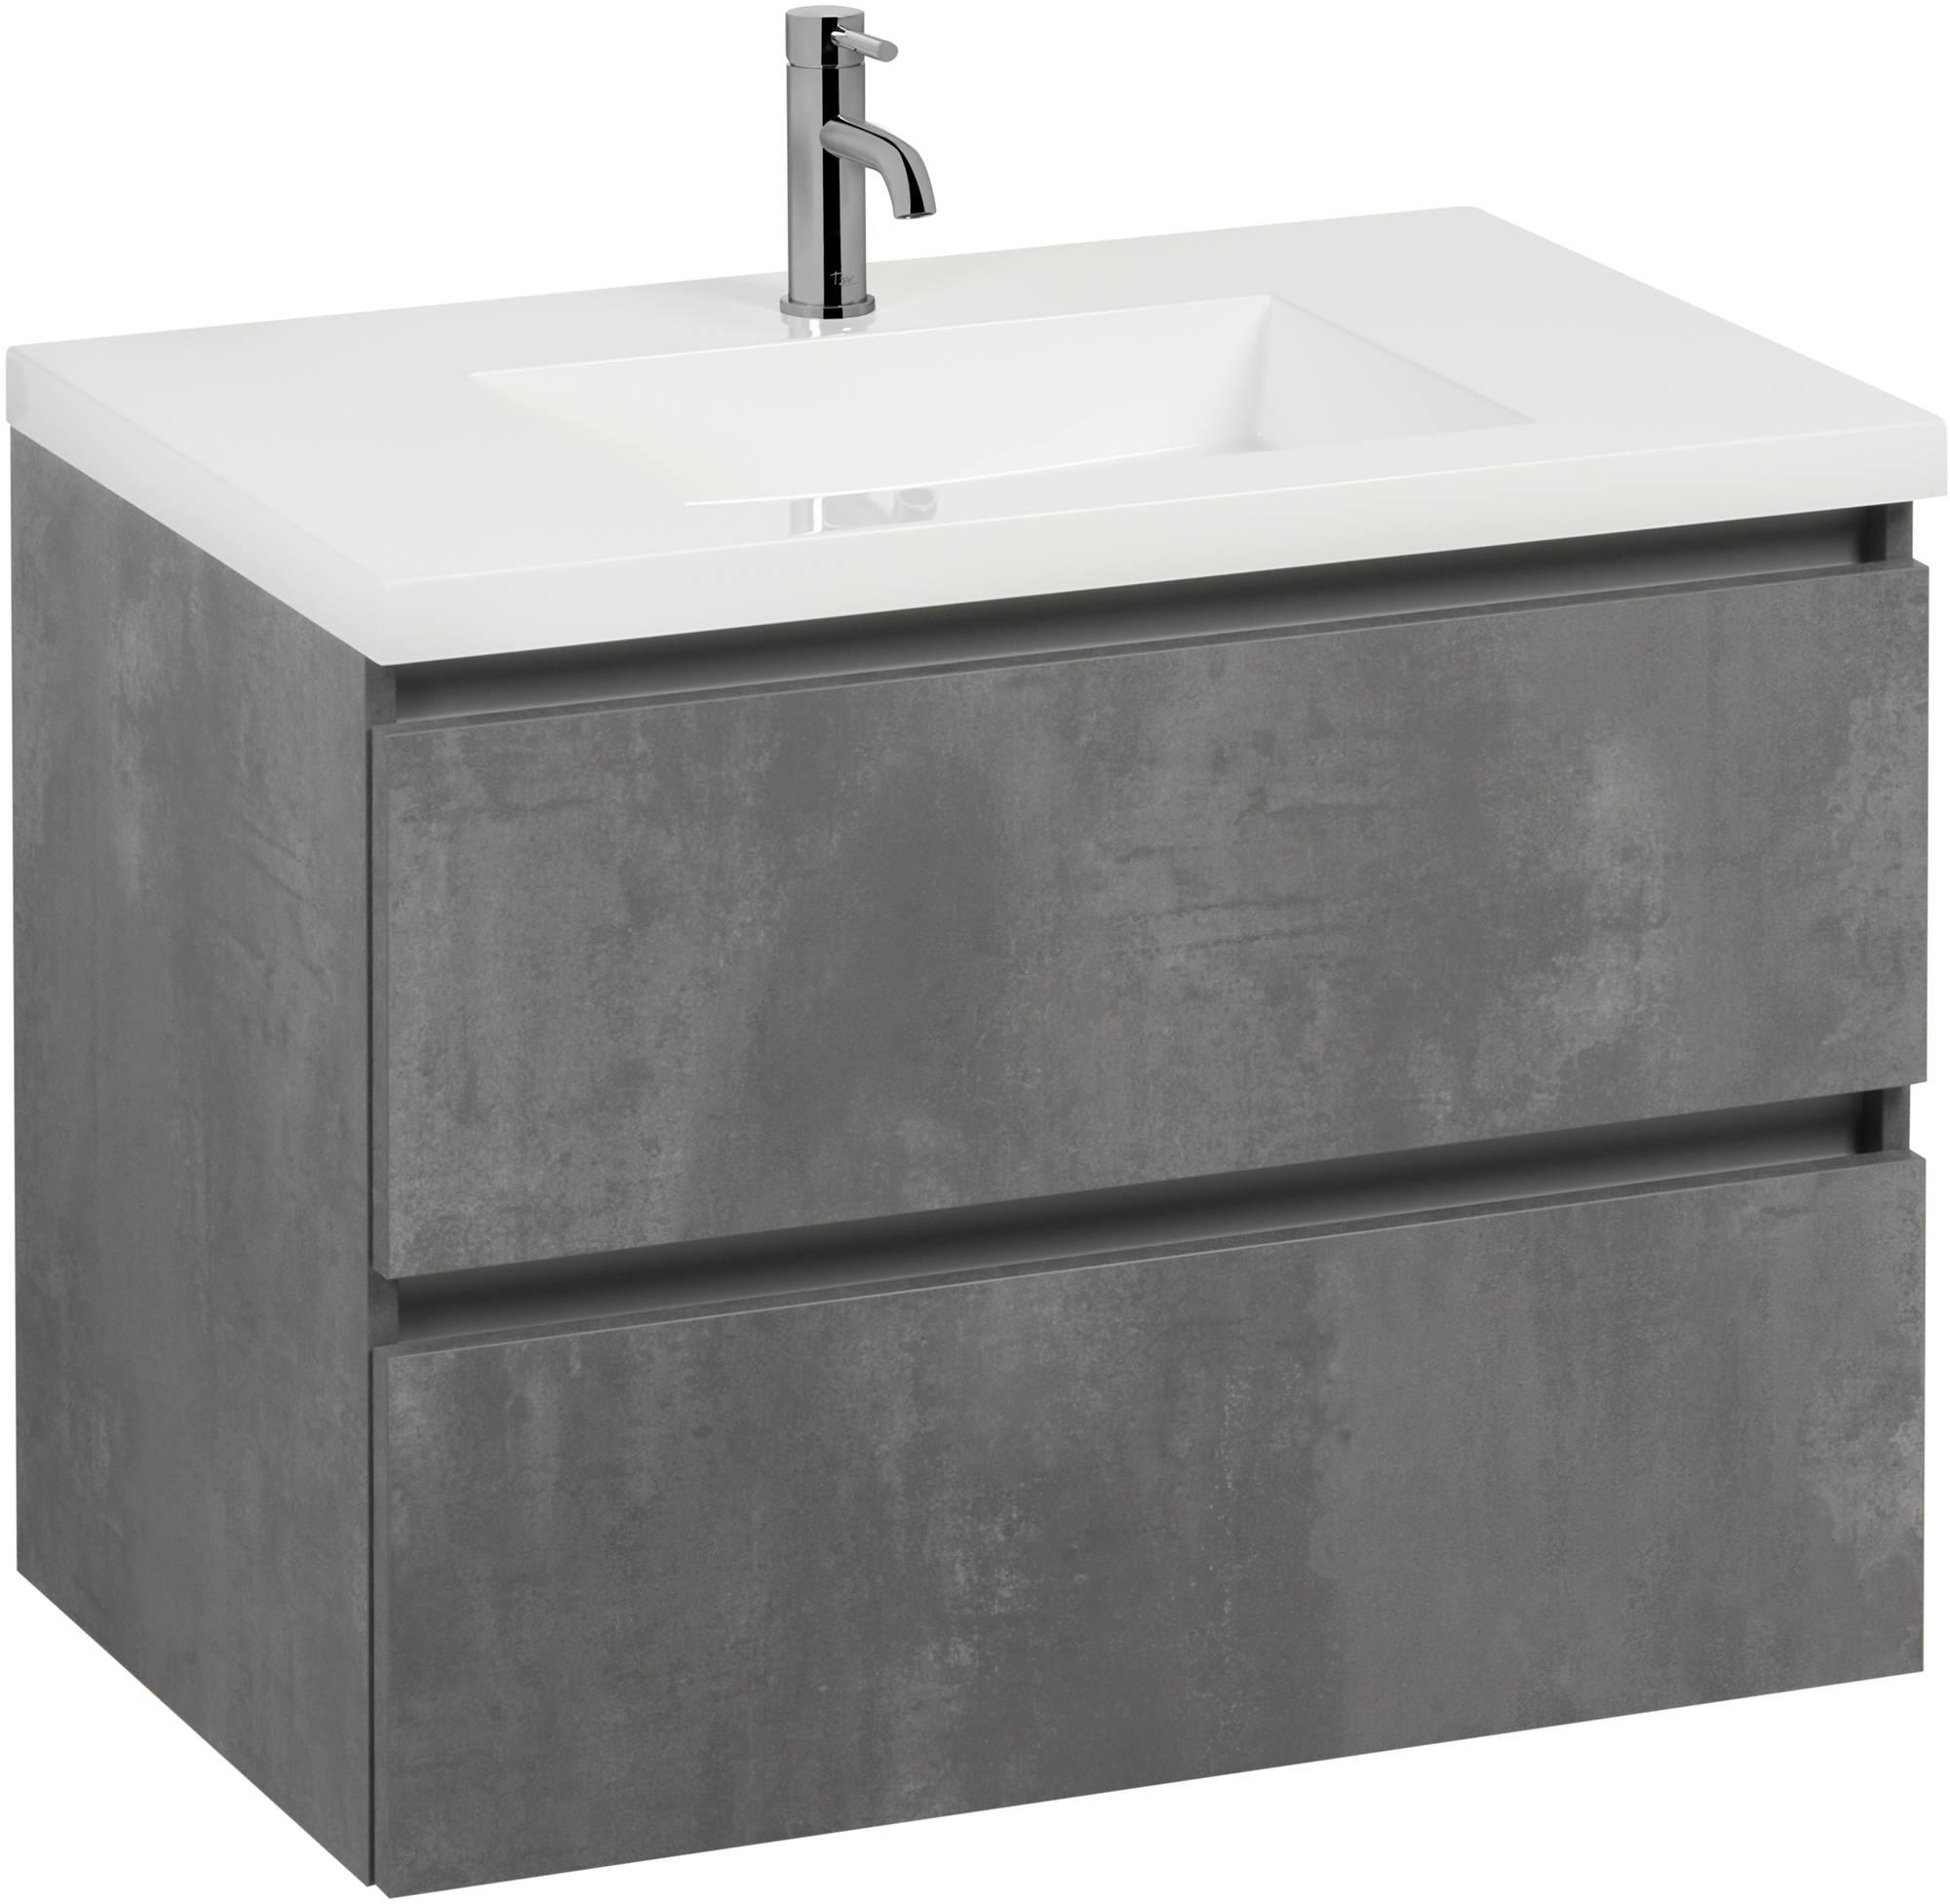 Saniselect Guarda meubelset 2 lades met mineraalmarmere wastafel greeploos 80cm Beton Grijs